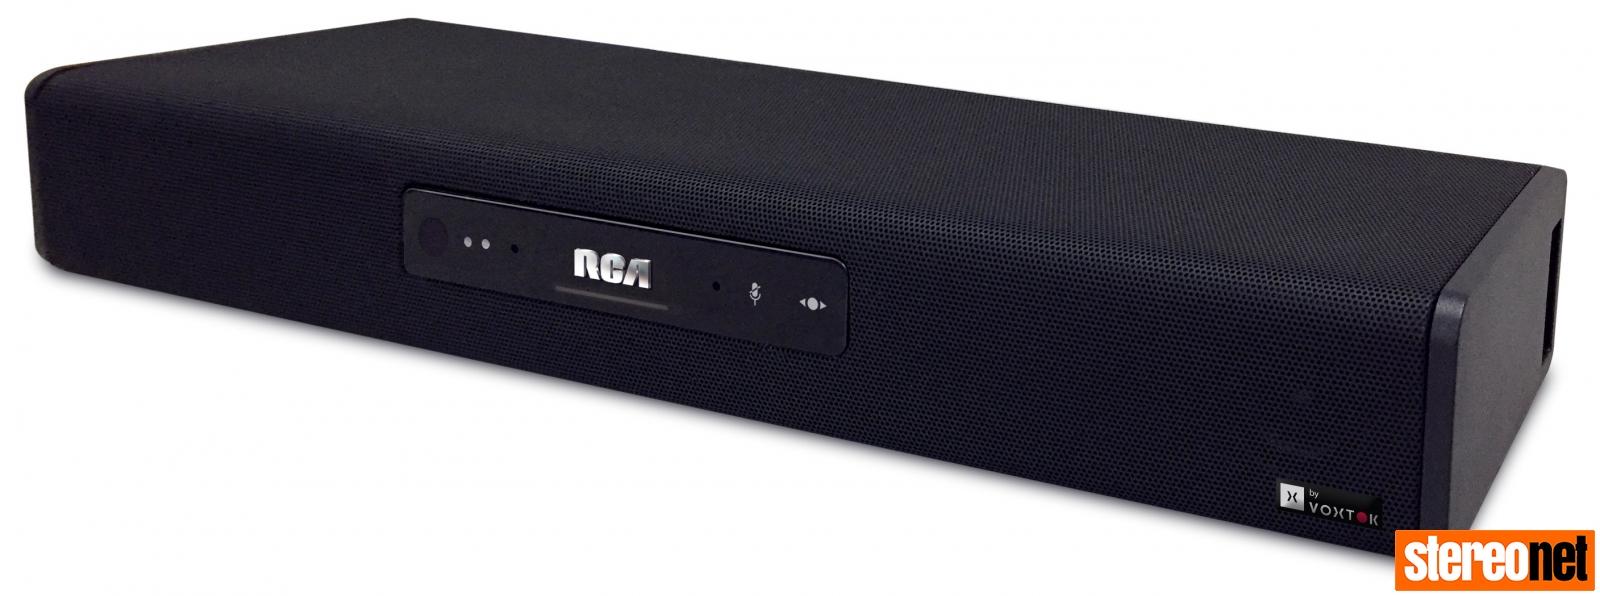 RCA Smart SoundBar and Voxtok